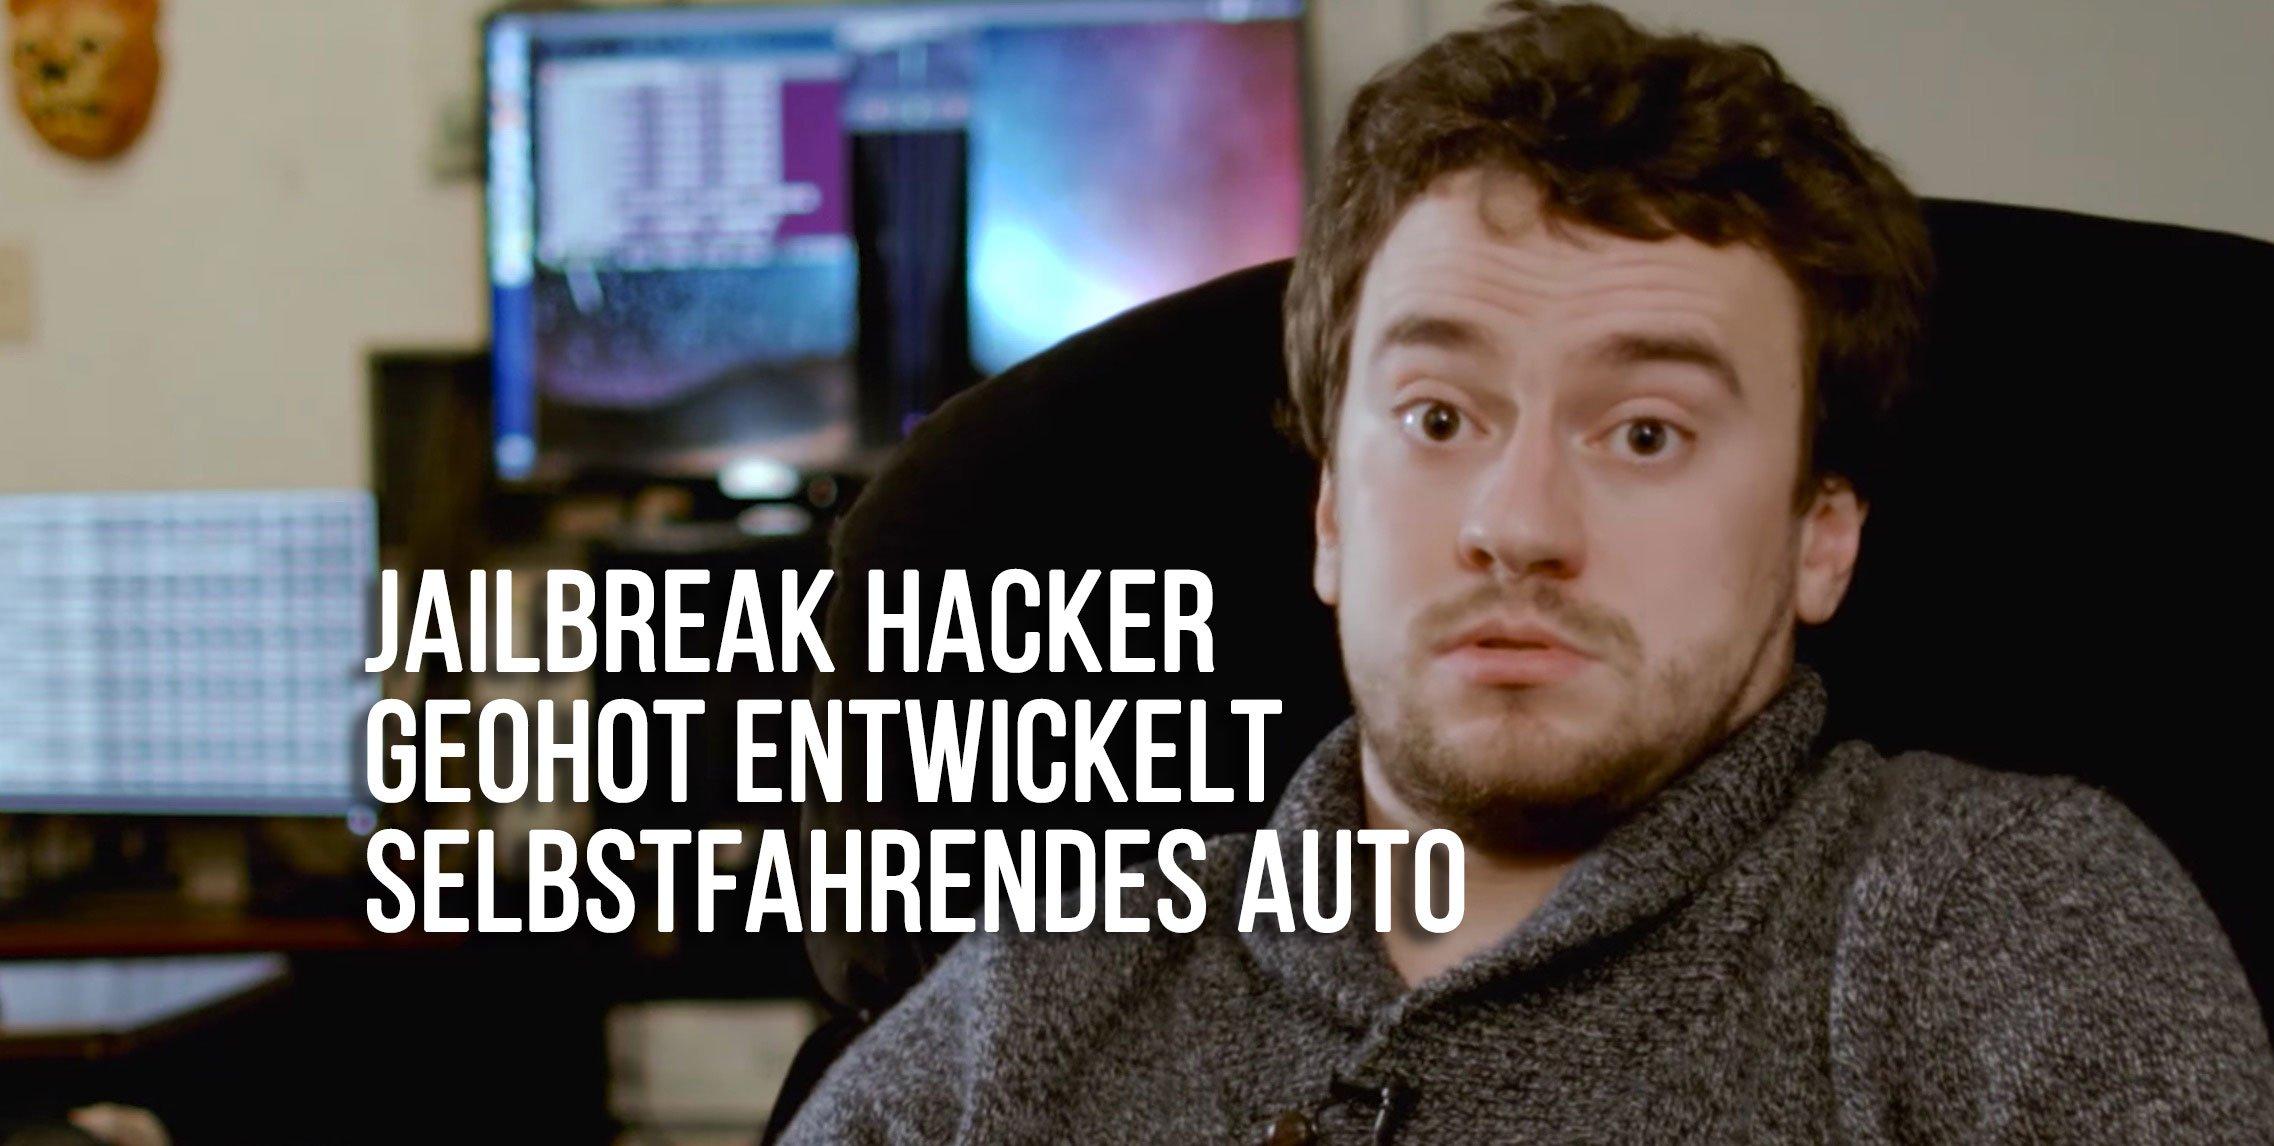 Jailbreak Hacker Geohot entwickelt selbstfahrendes Auto 1